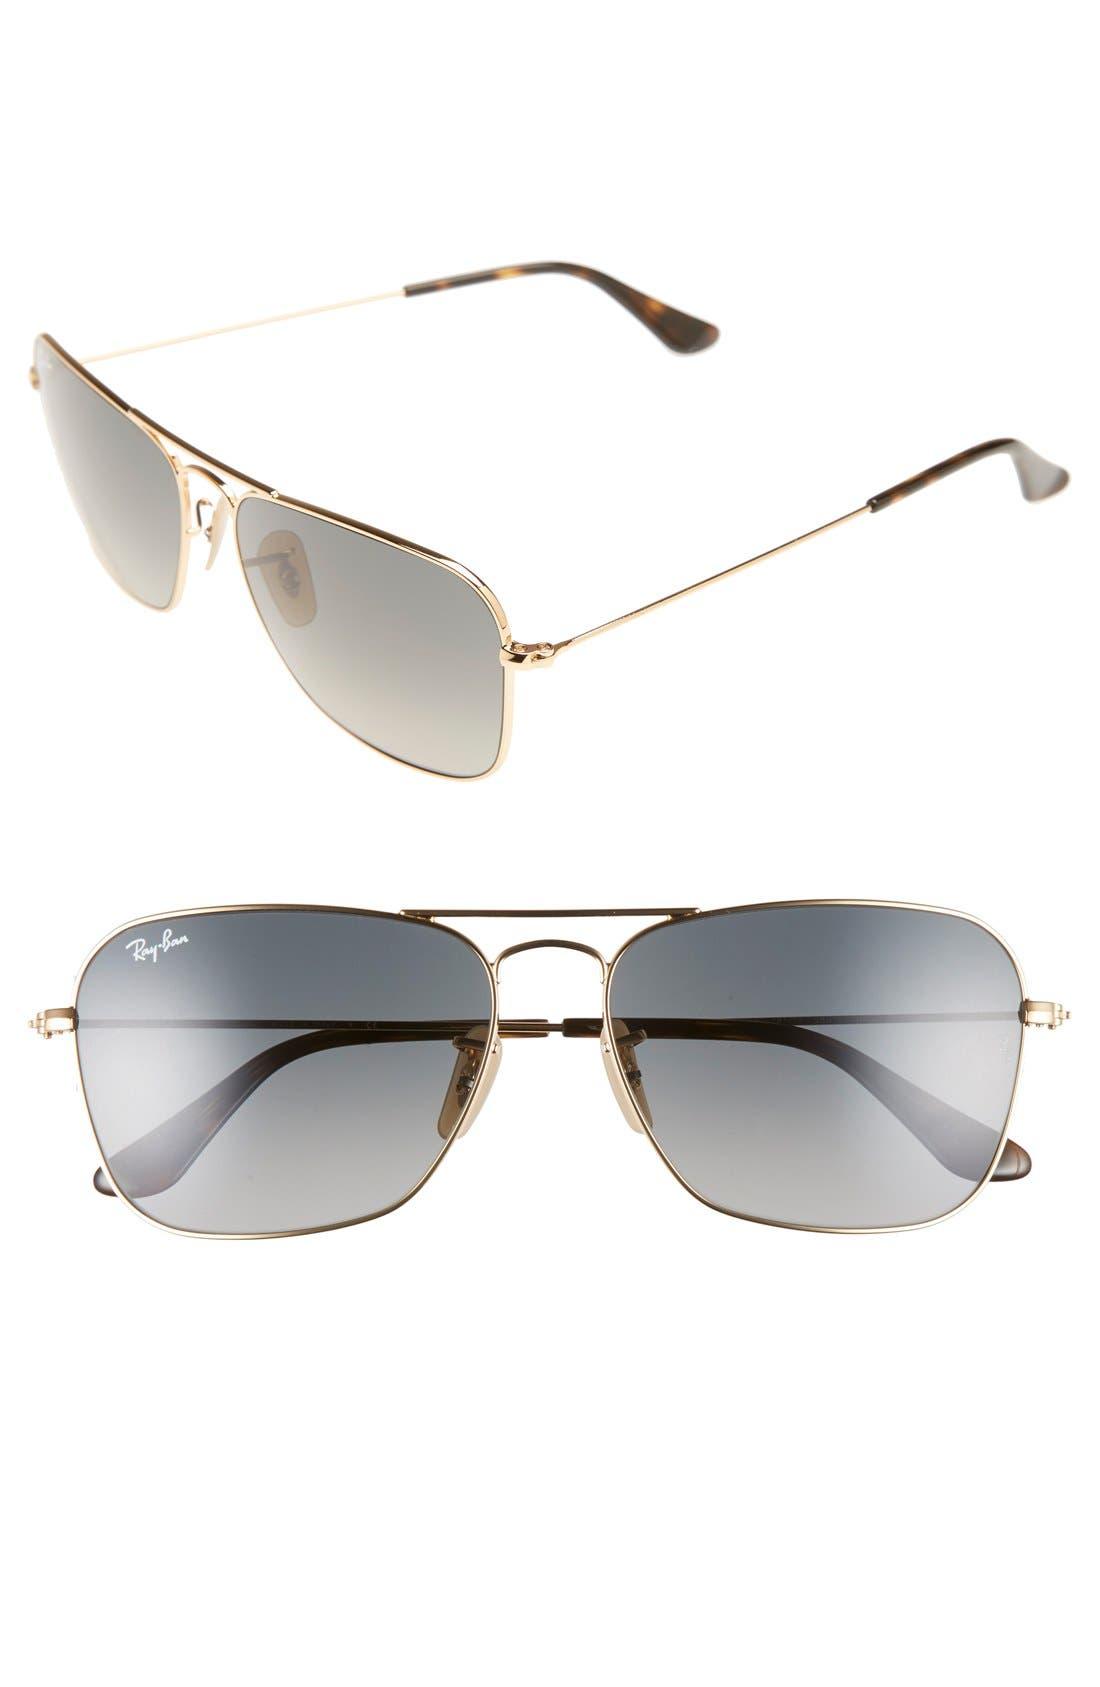 RAY-BAN, Caravan 58mm Aviator Sunglasses, Main thumbnail 1, color, GOLD/ GREY GRADIENT